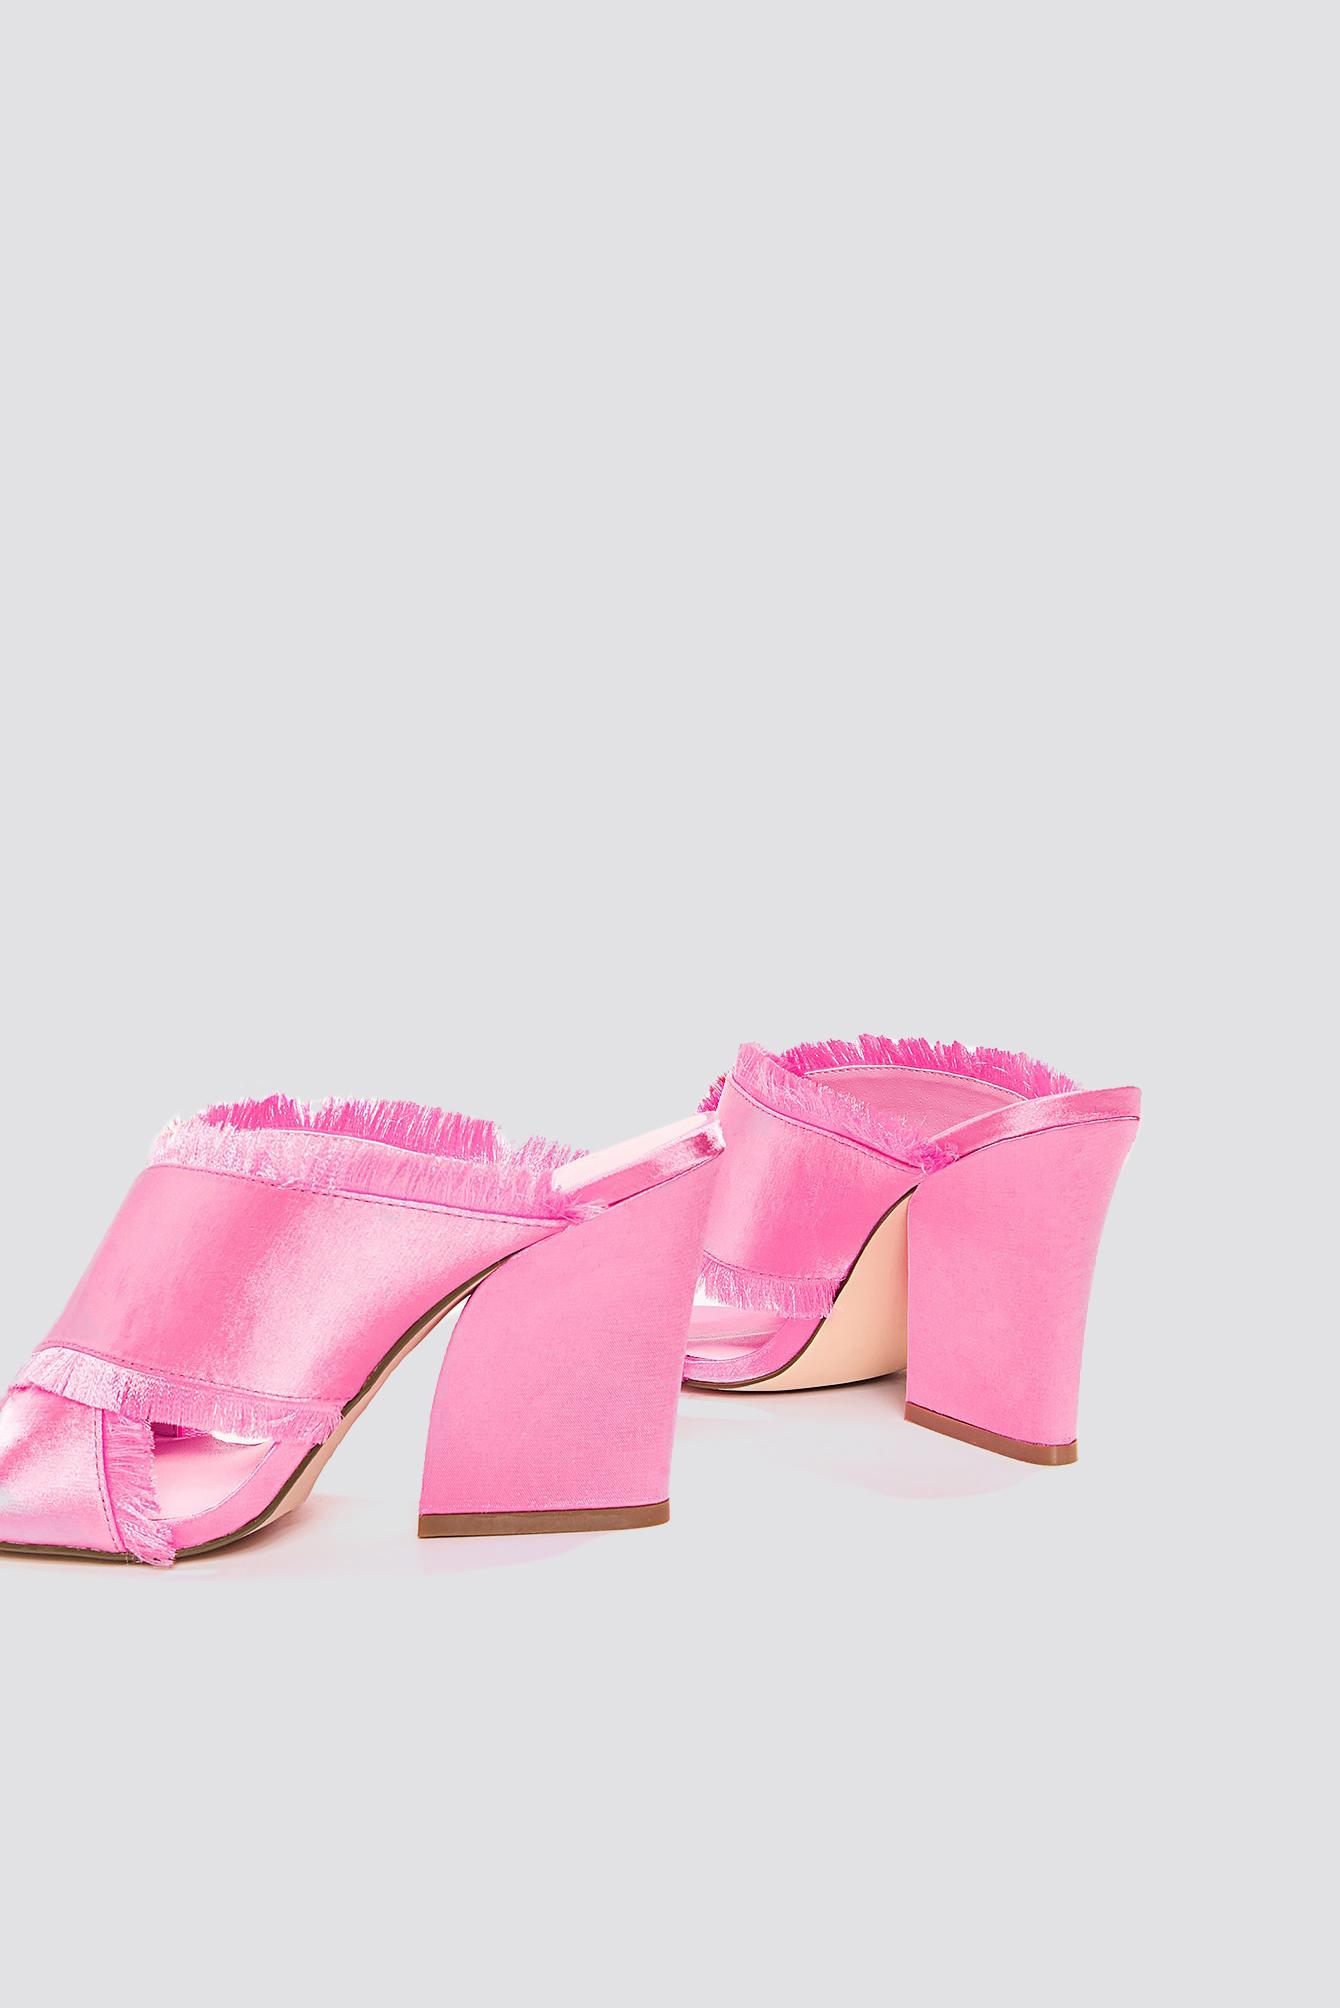 NA-KD Shoes Satin Cross Mule Heels - Pink m1iOcVTmi